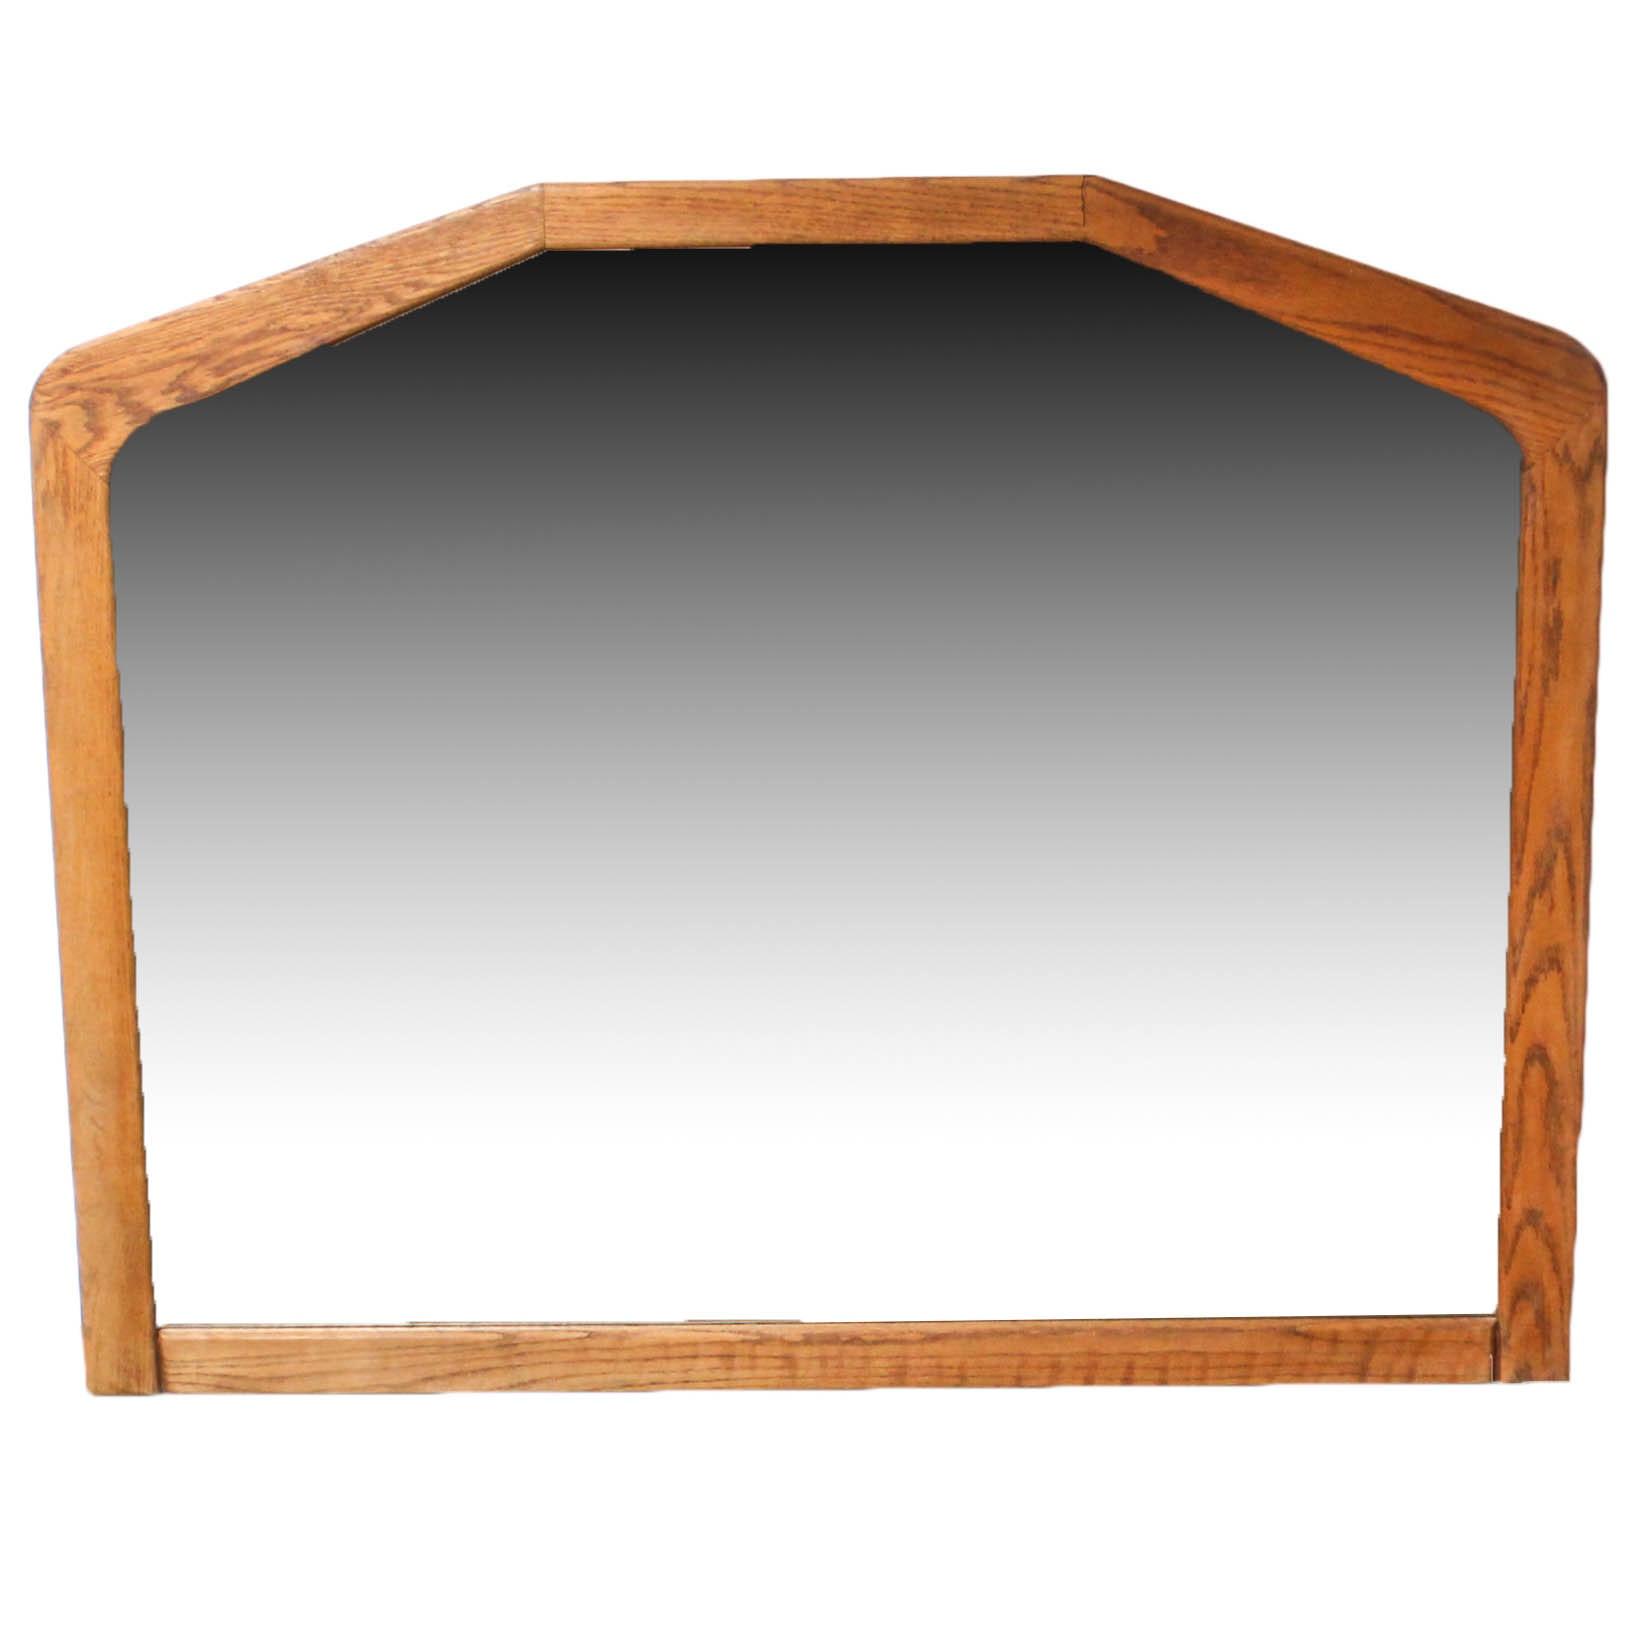 Oak Framed Wall Mirror by Arbek, Late 20th Century